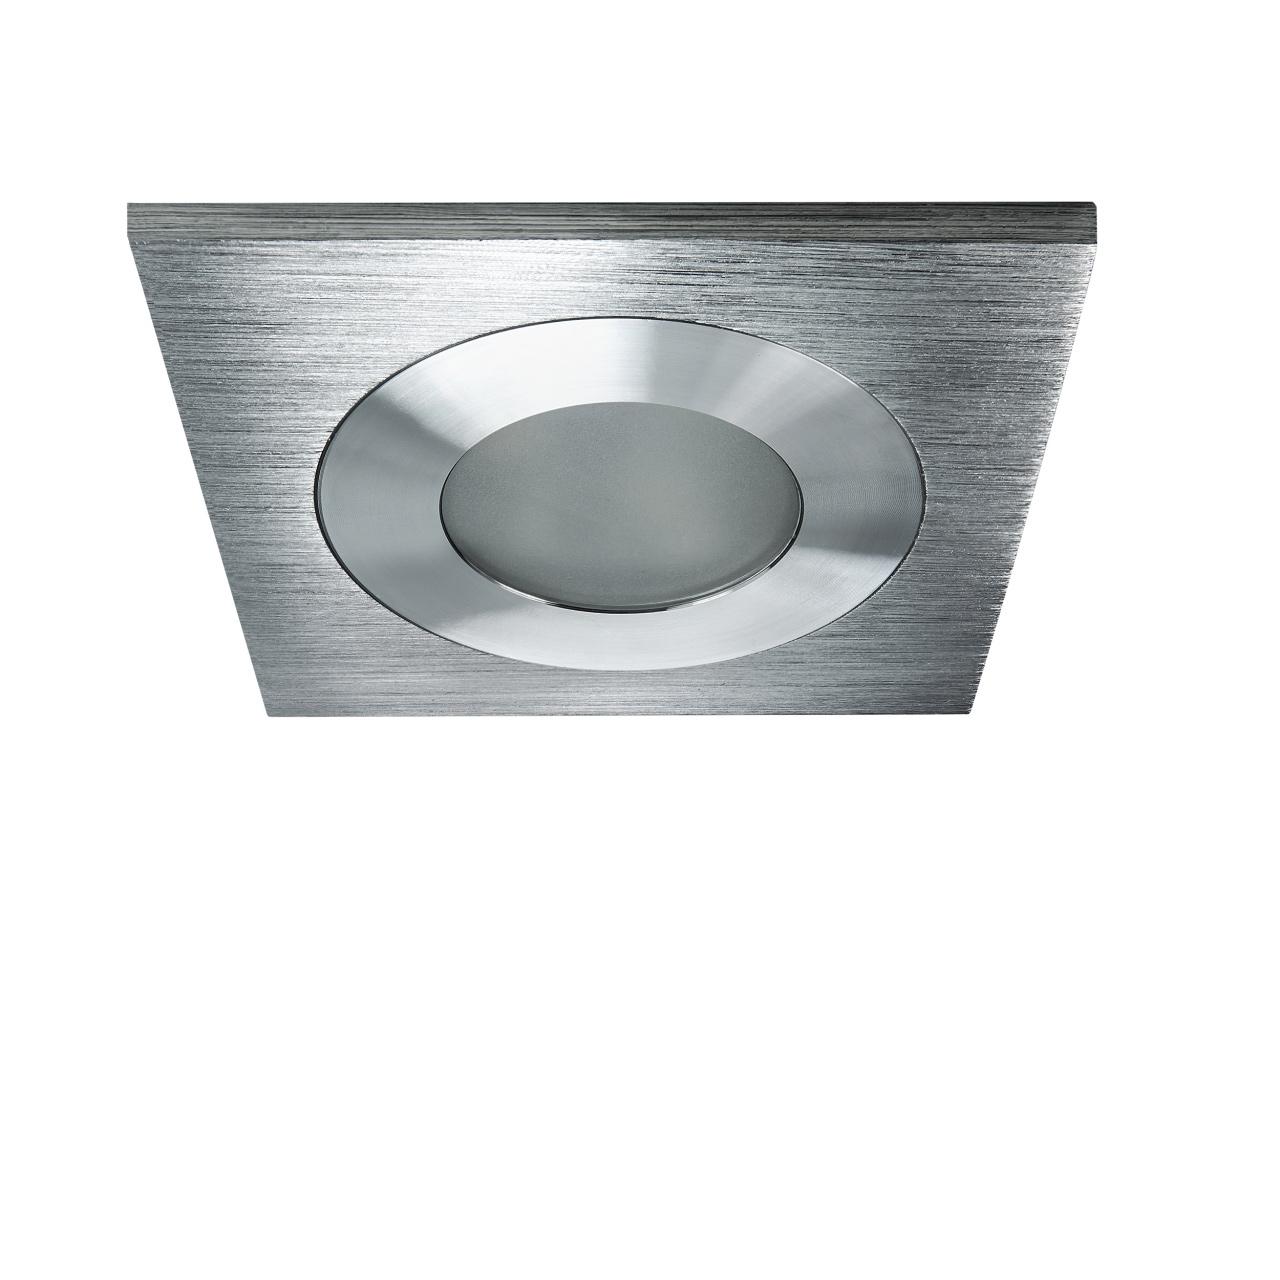 Светильник Leddy quad LED 3W 240LM алюминий 4000K в стену в подрозетник с трансф Lightstar 212181